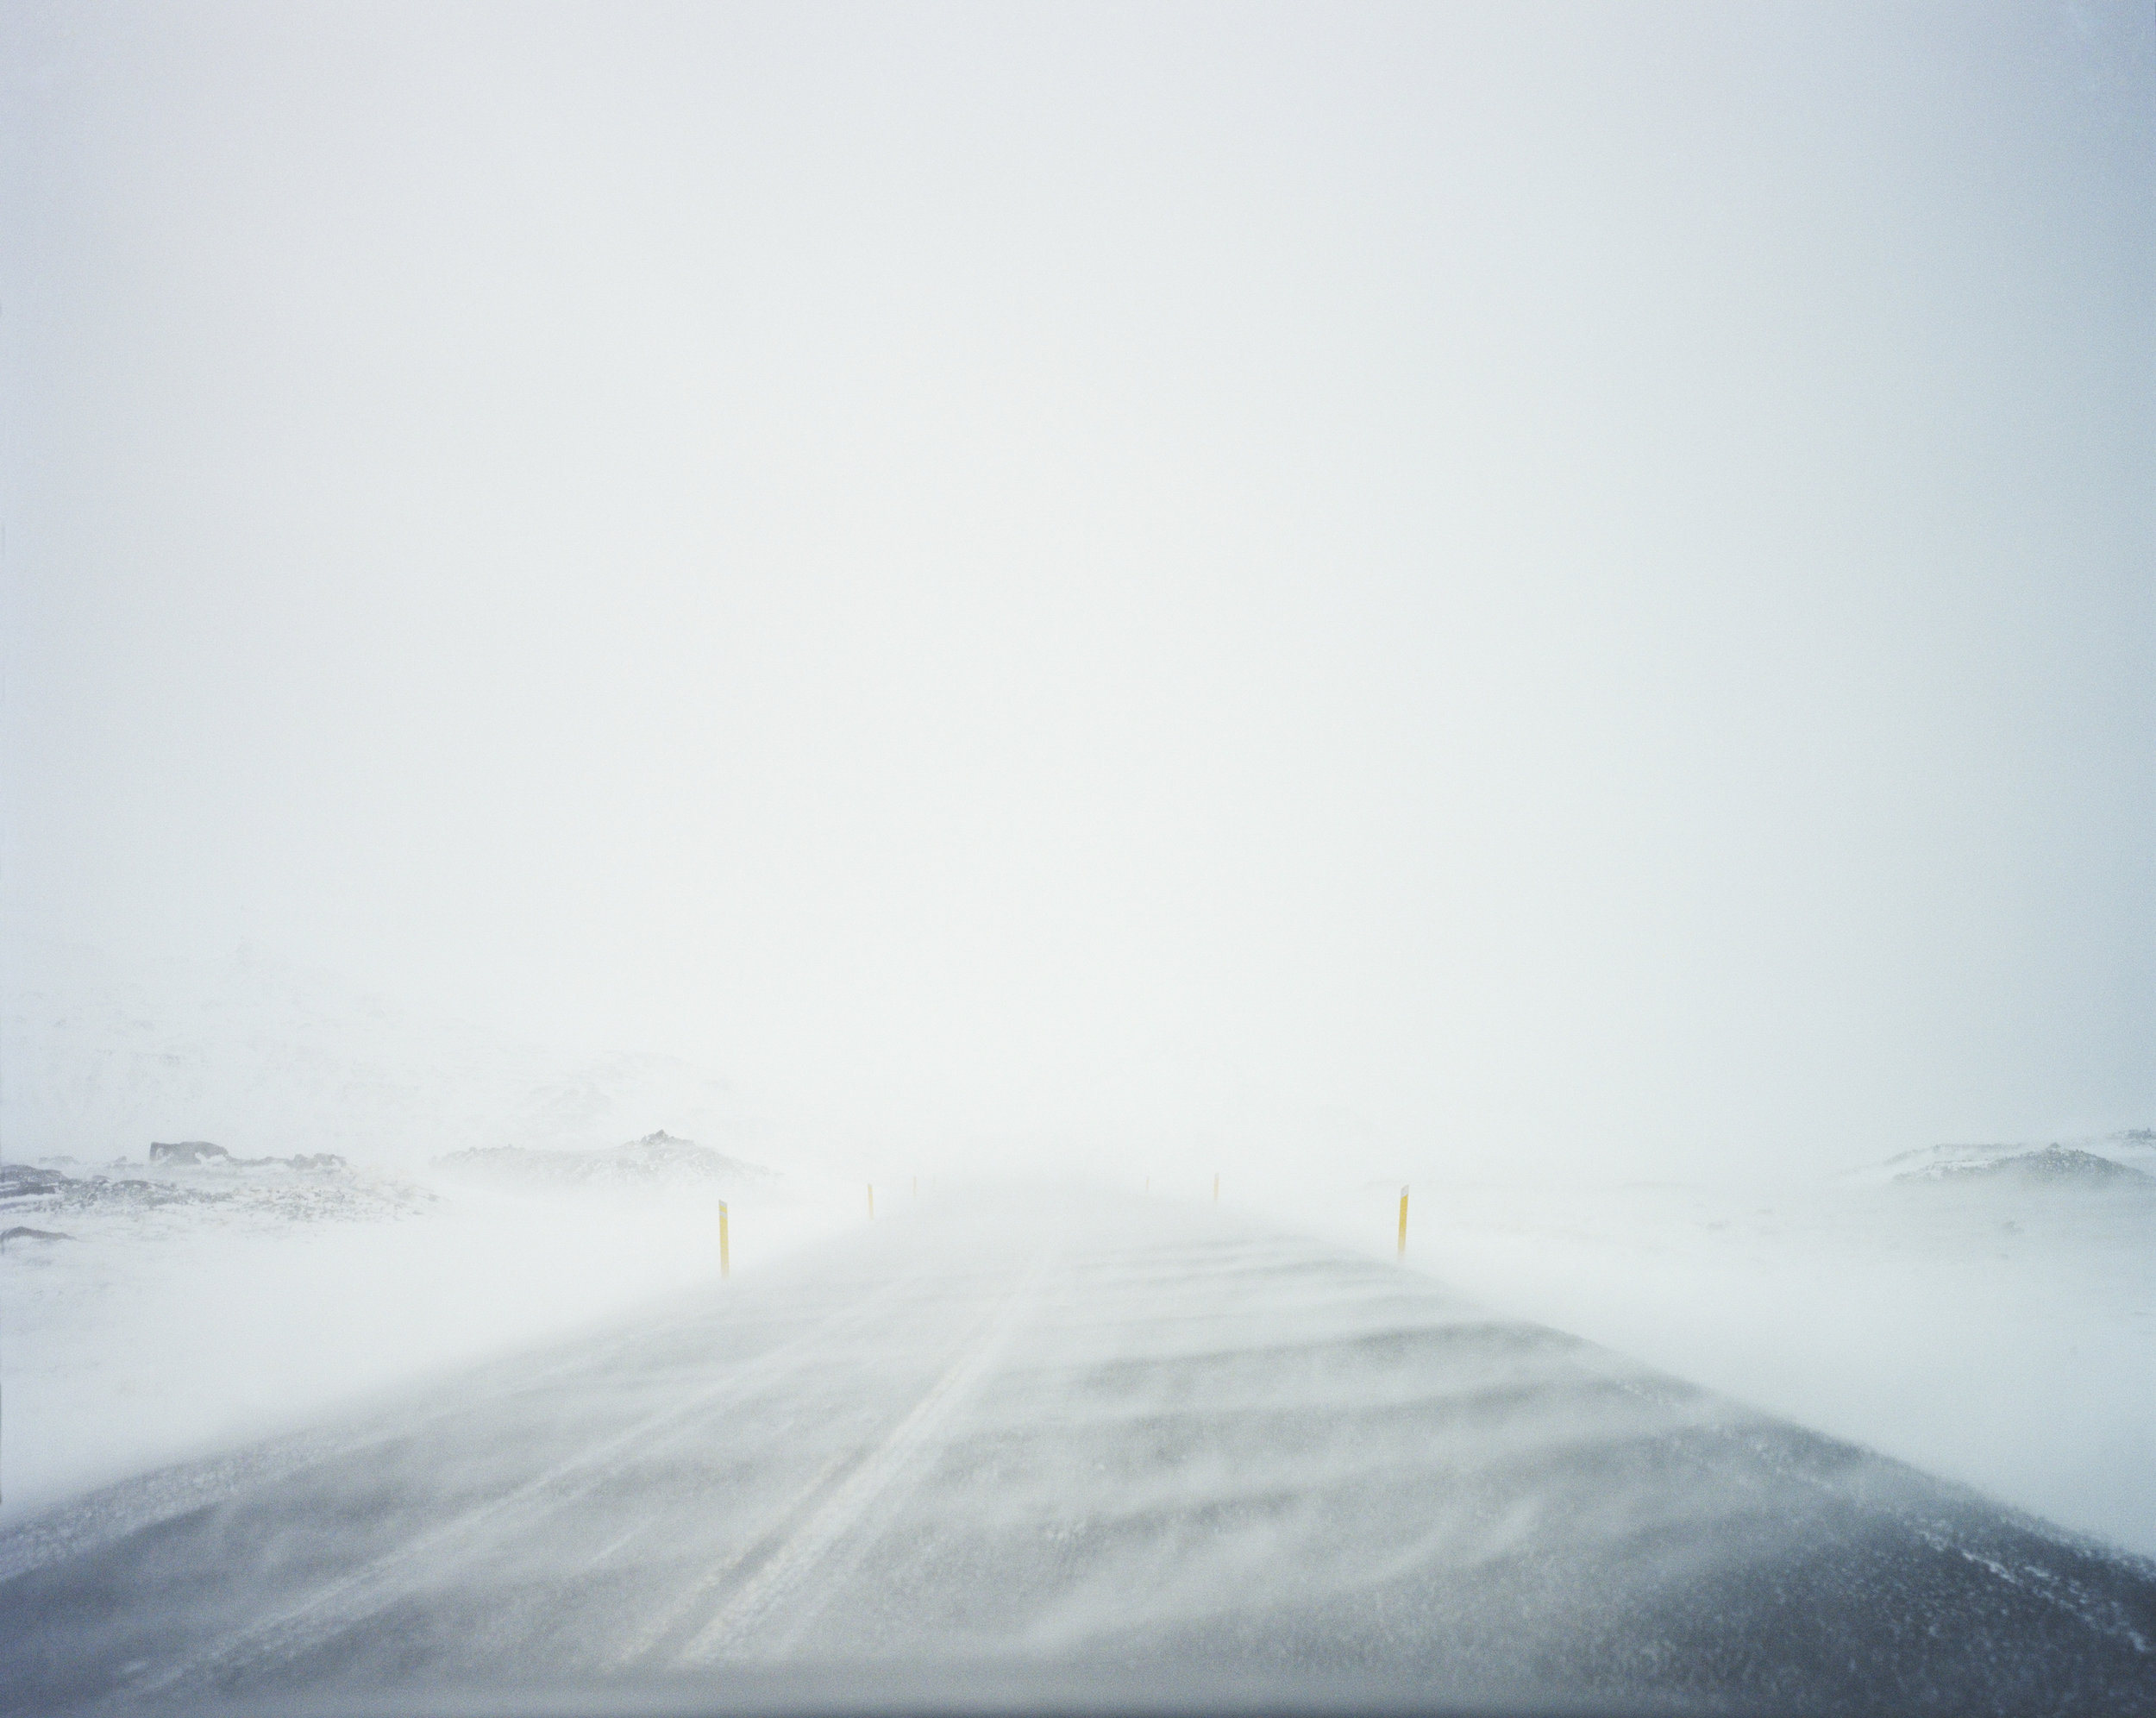 Dyrholavegur (road), Iceland, 2013